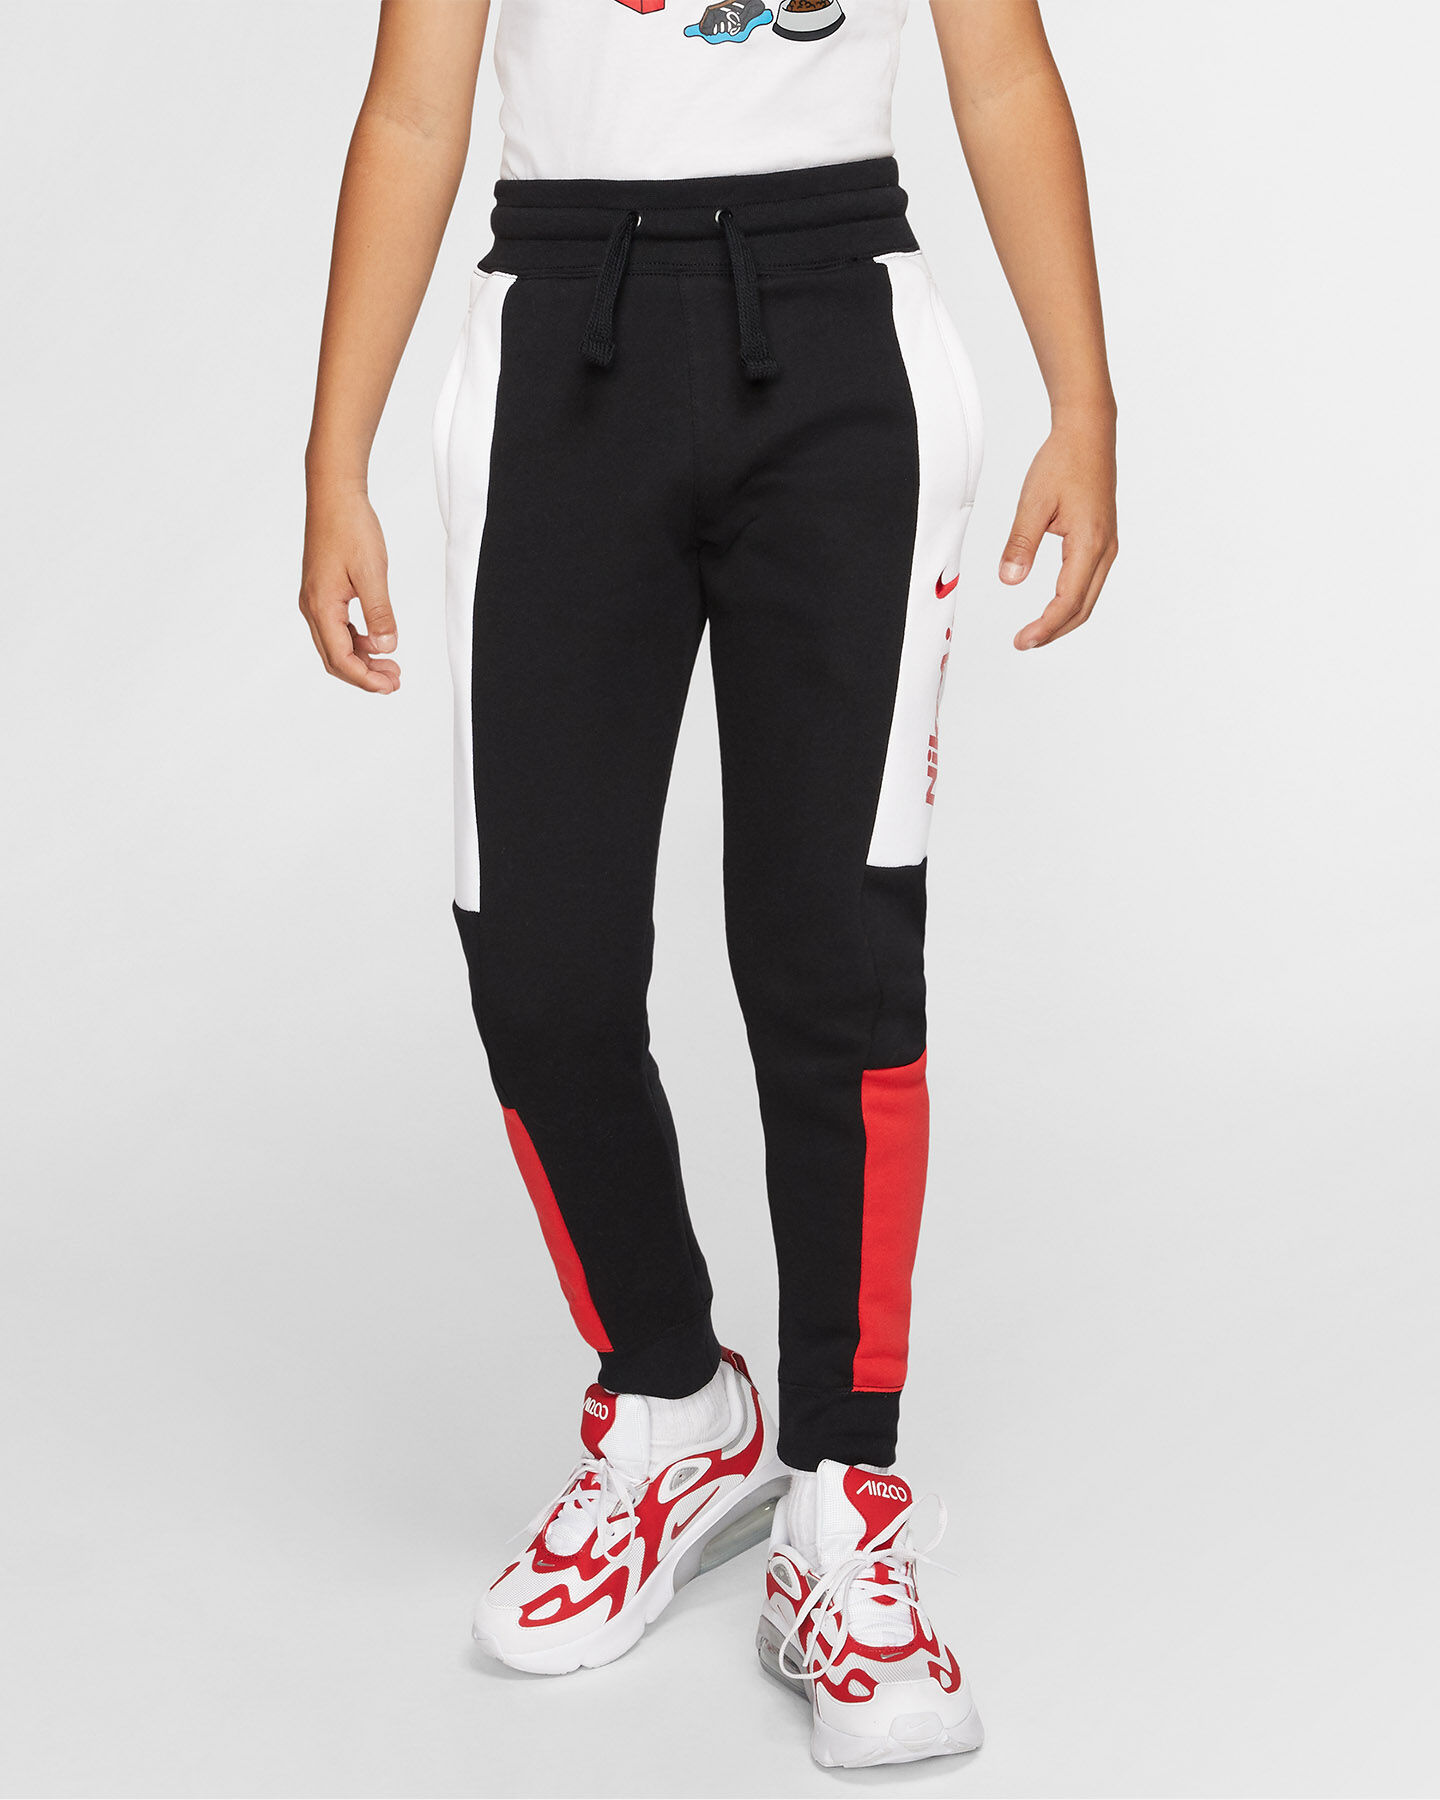 Pantalone NIKE AIR JR S5164586 scatto 2